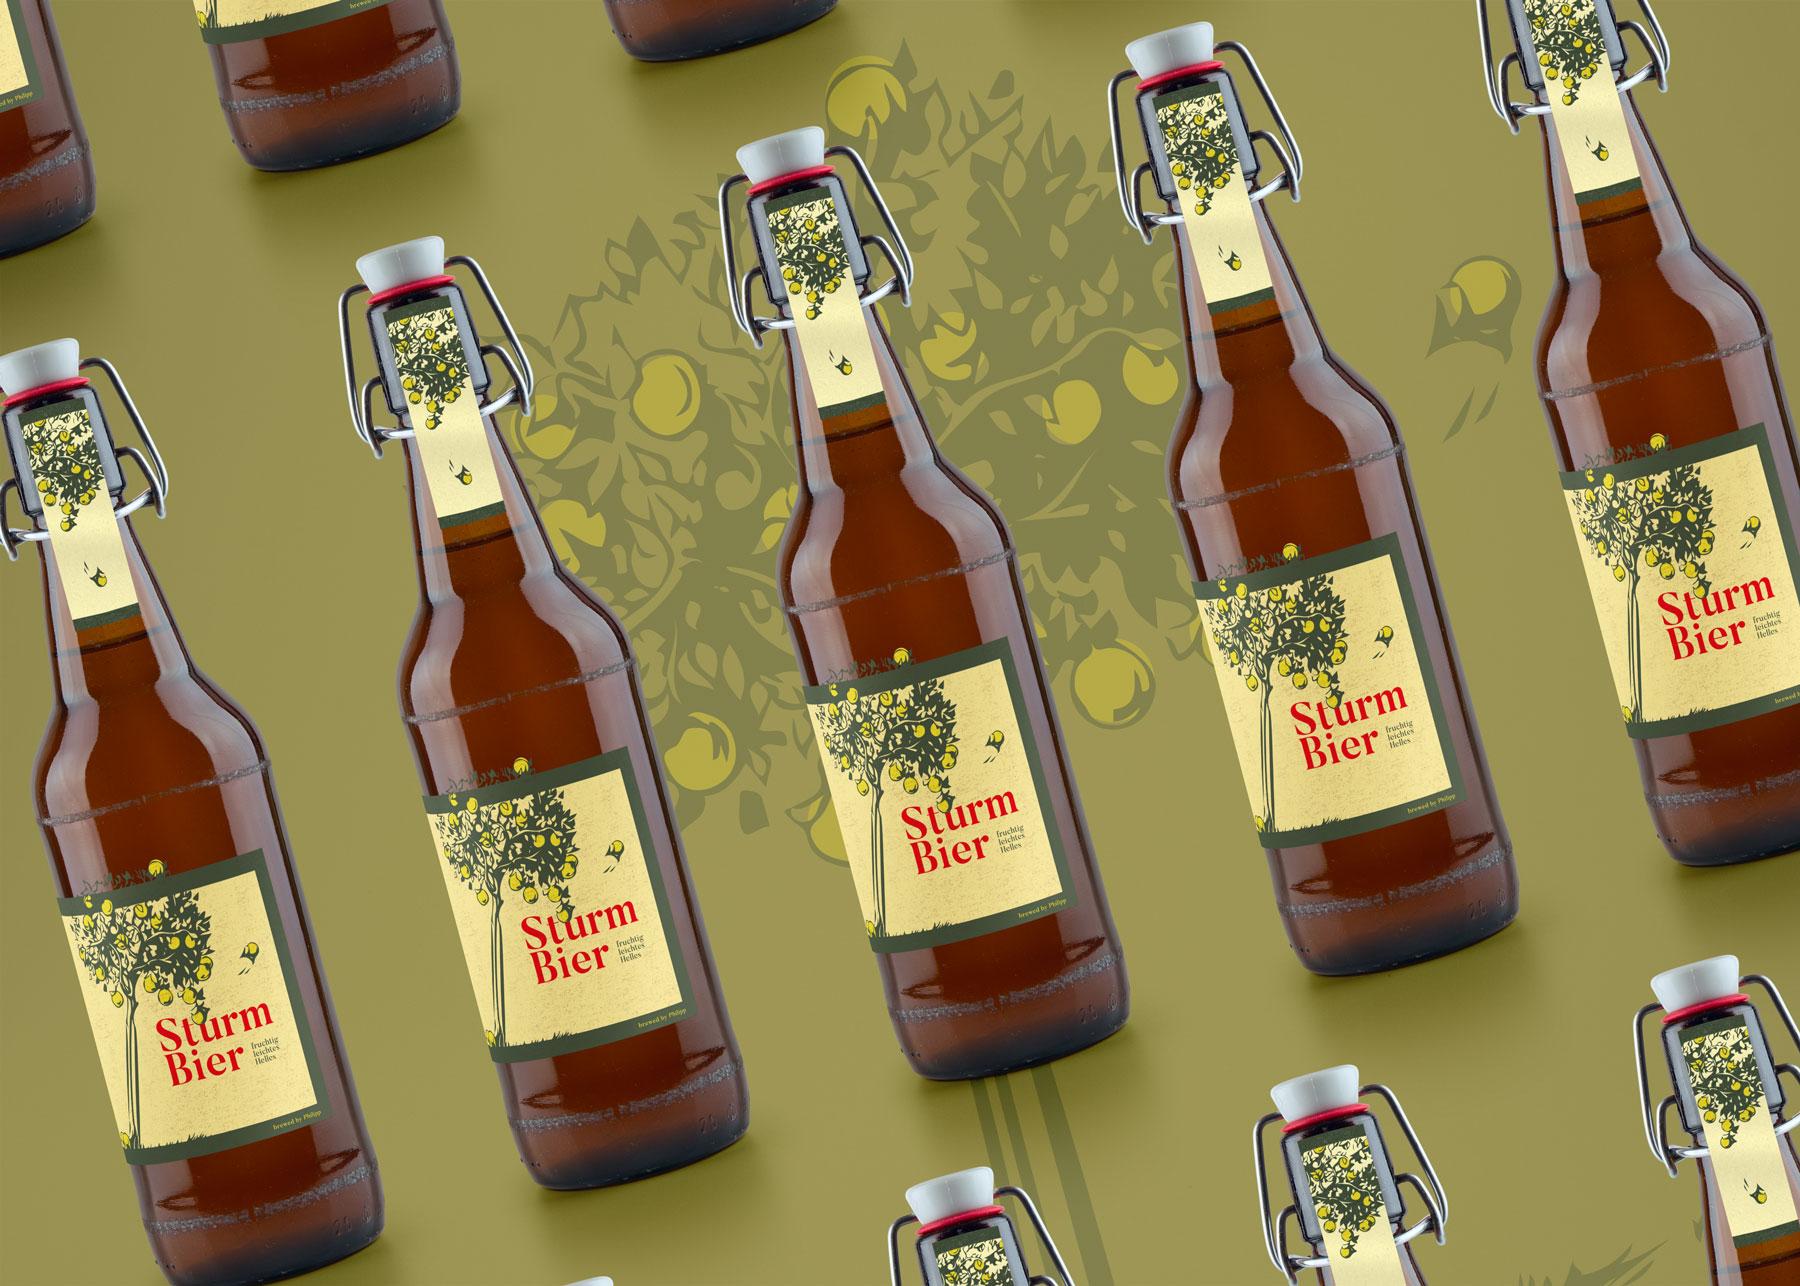 beer-packaging-design-sturm-bier-by-max-duchardt